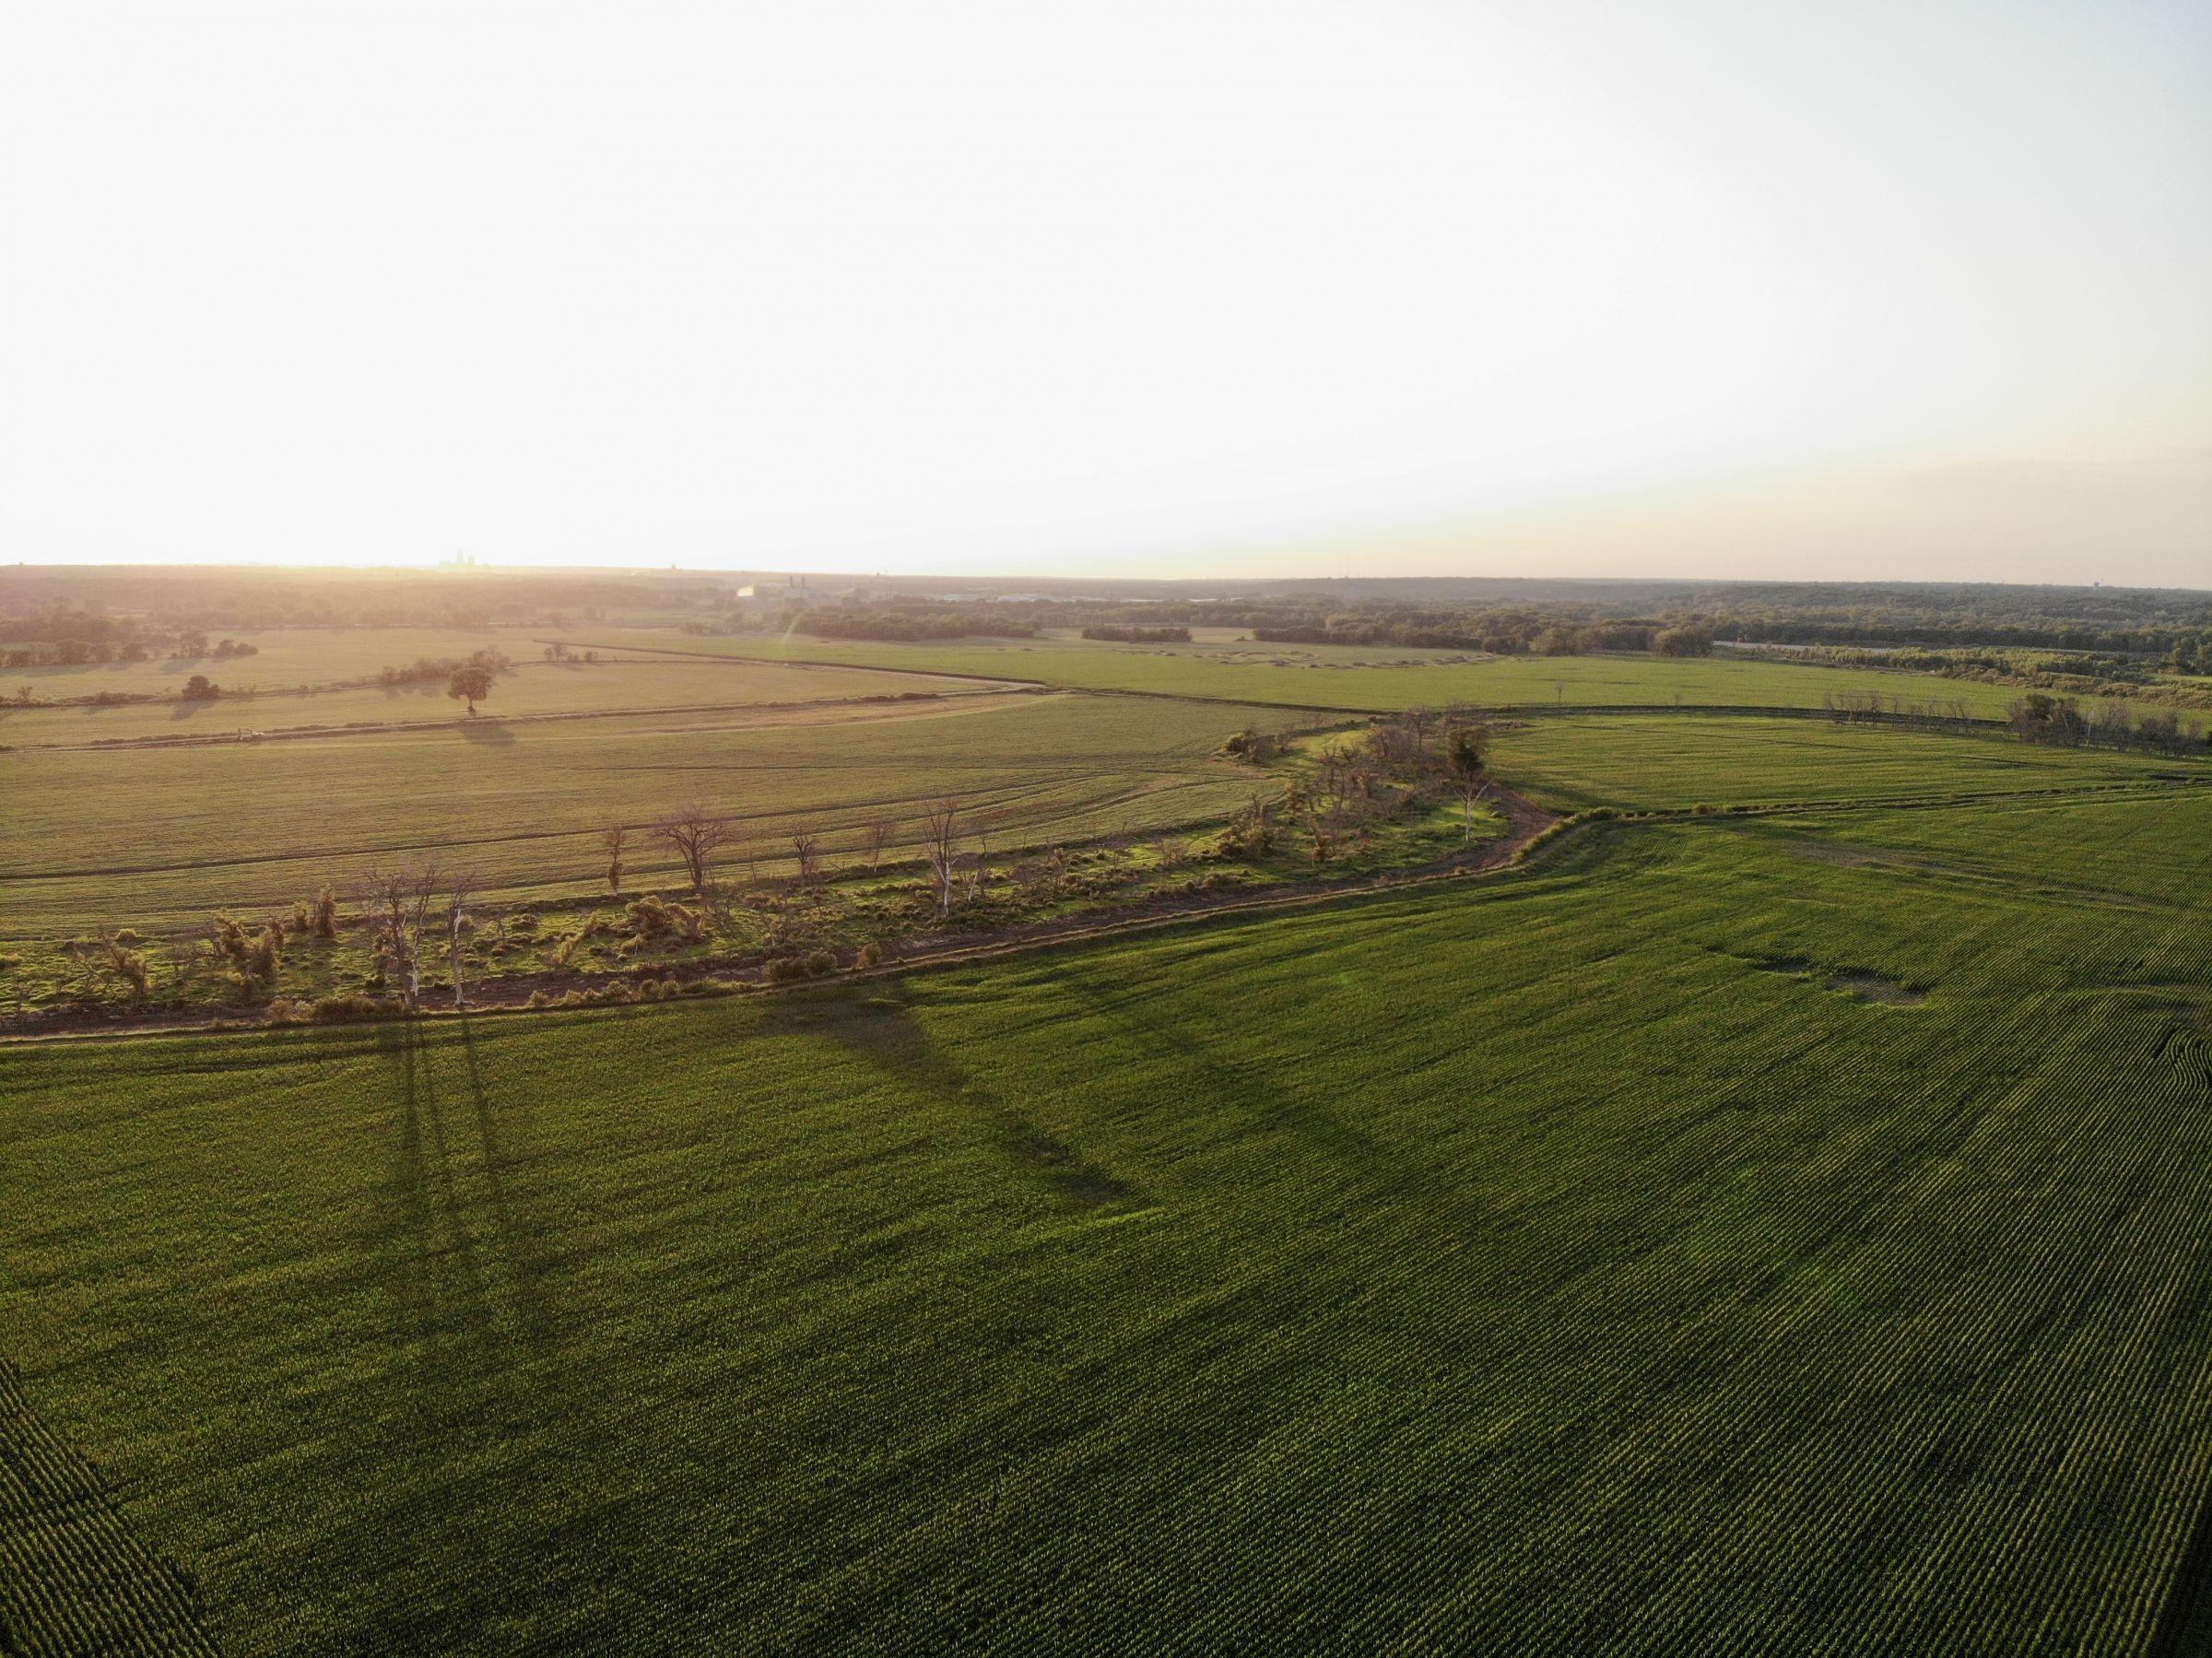 land-polk-county-iowa-202-acres-listing-number-15625-4-2021-07-09-140047.jpg